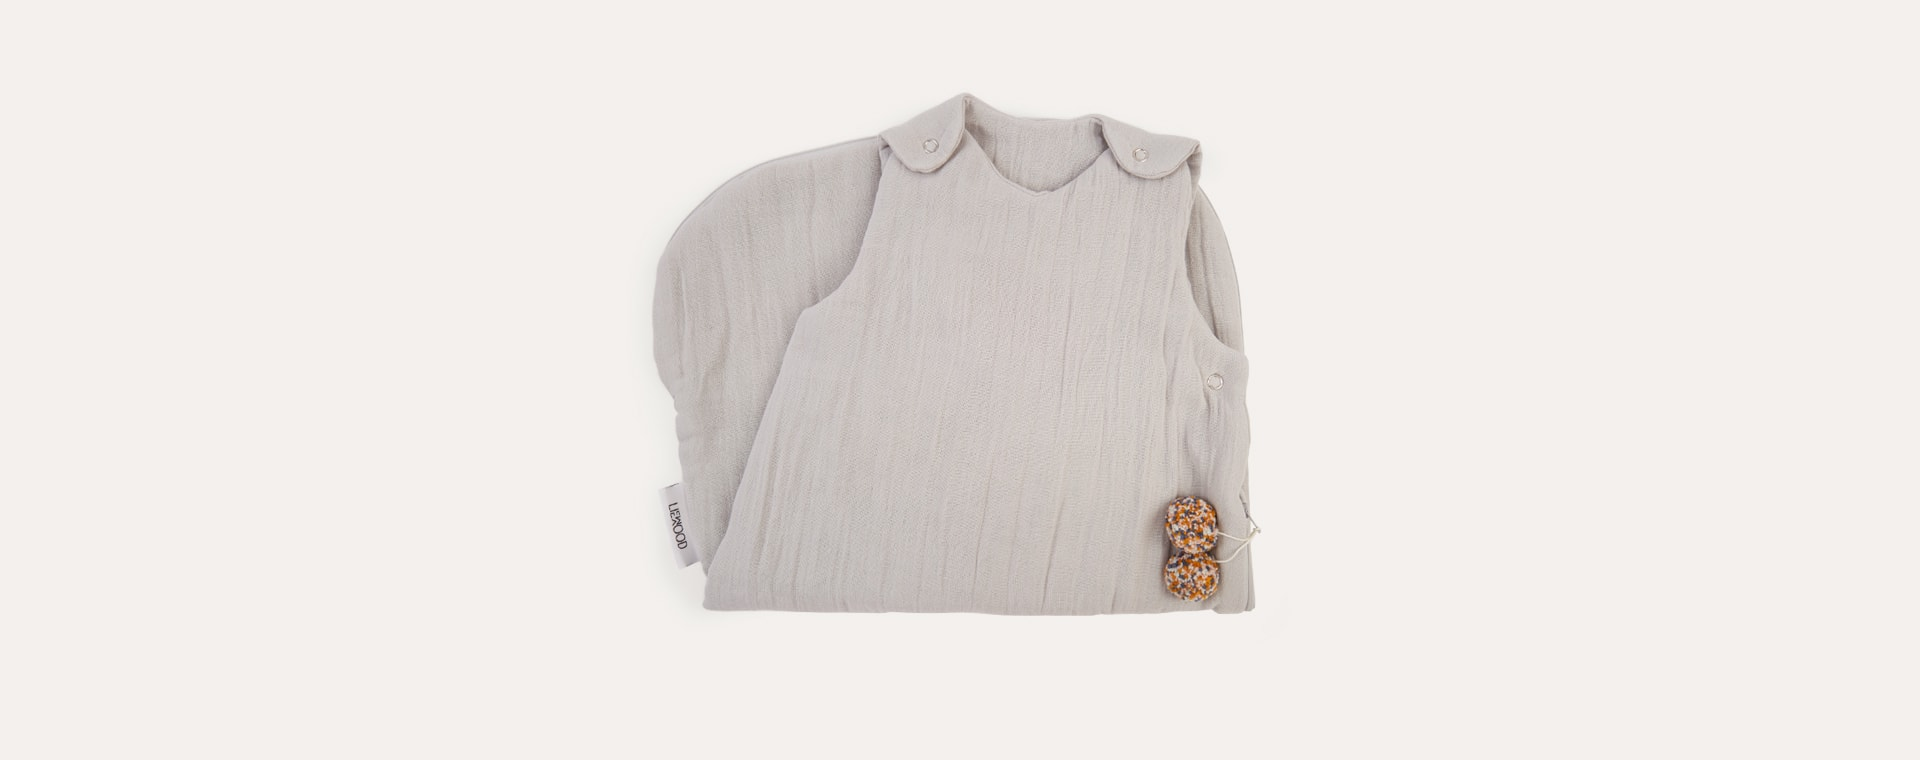 Dumbo Grey Liewood Sleeping Bag